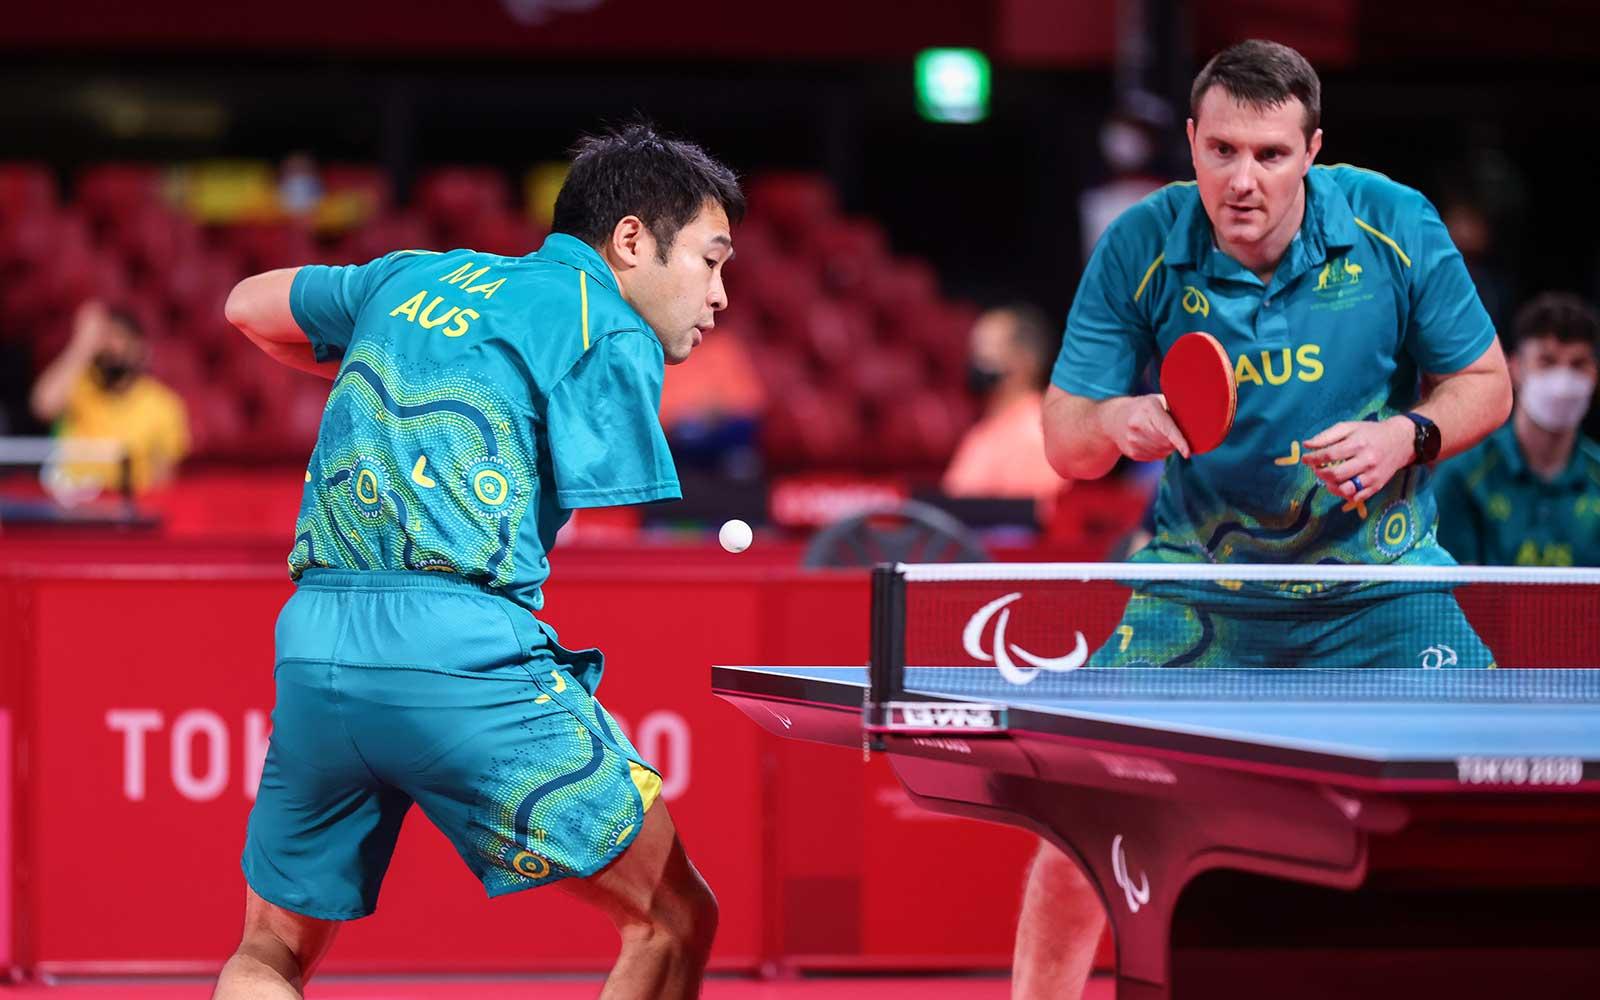 Australia To Break Para-Table Tennis Medal Record As Men's Team Secure Semi-Final Berth